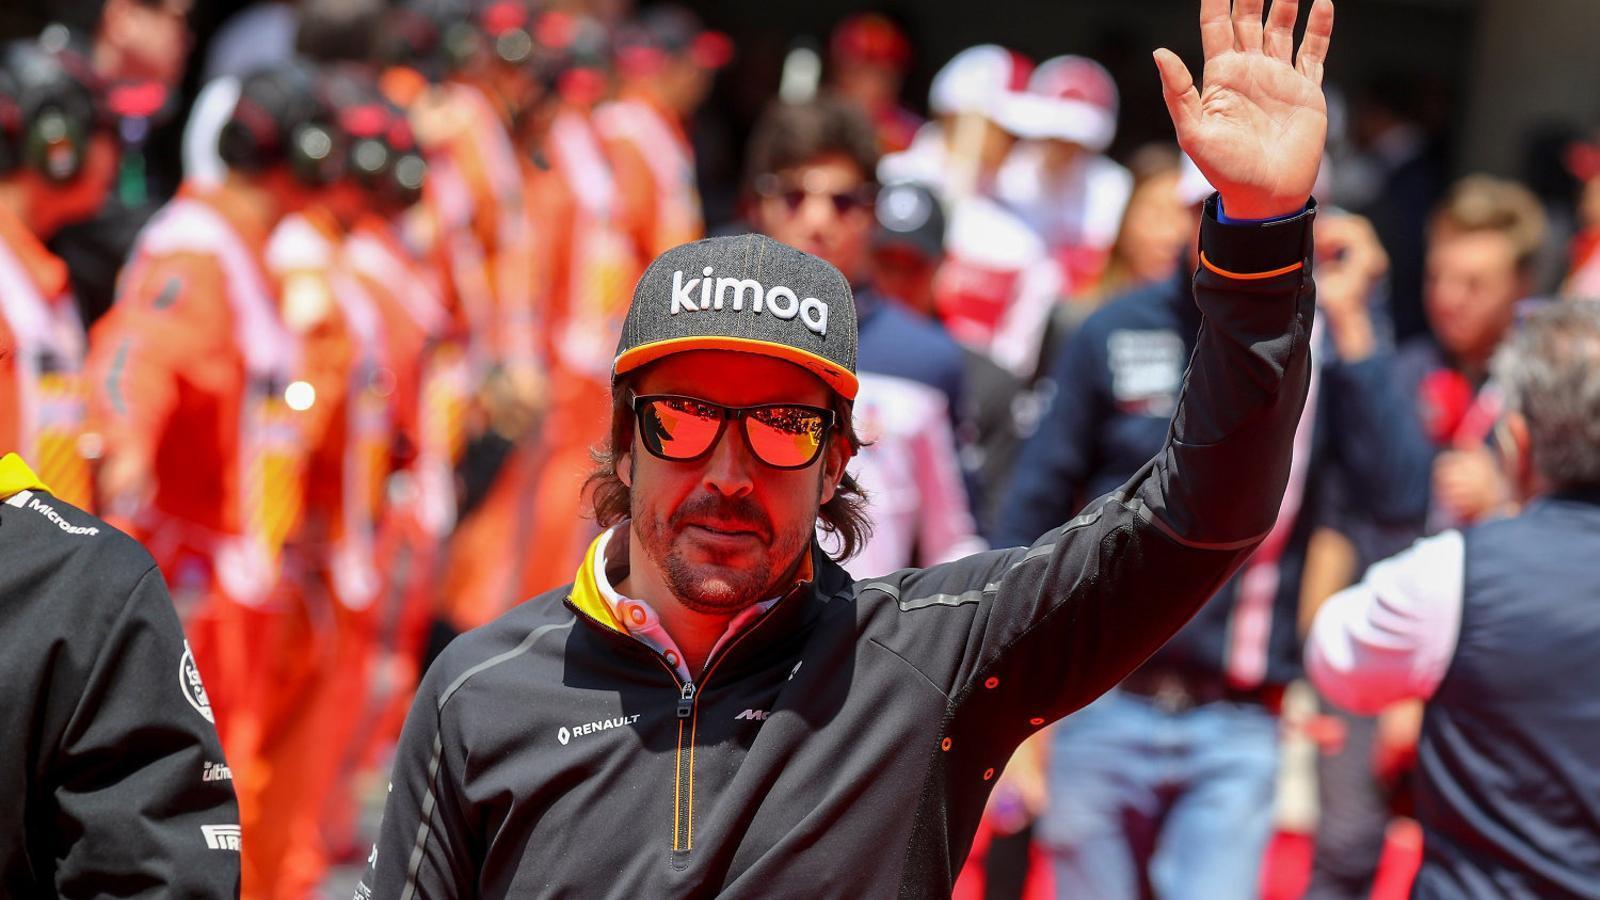 Fernando Alonso comença a mirar-se la vida pel retrovisor